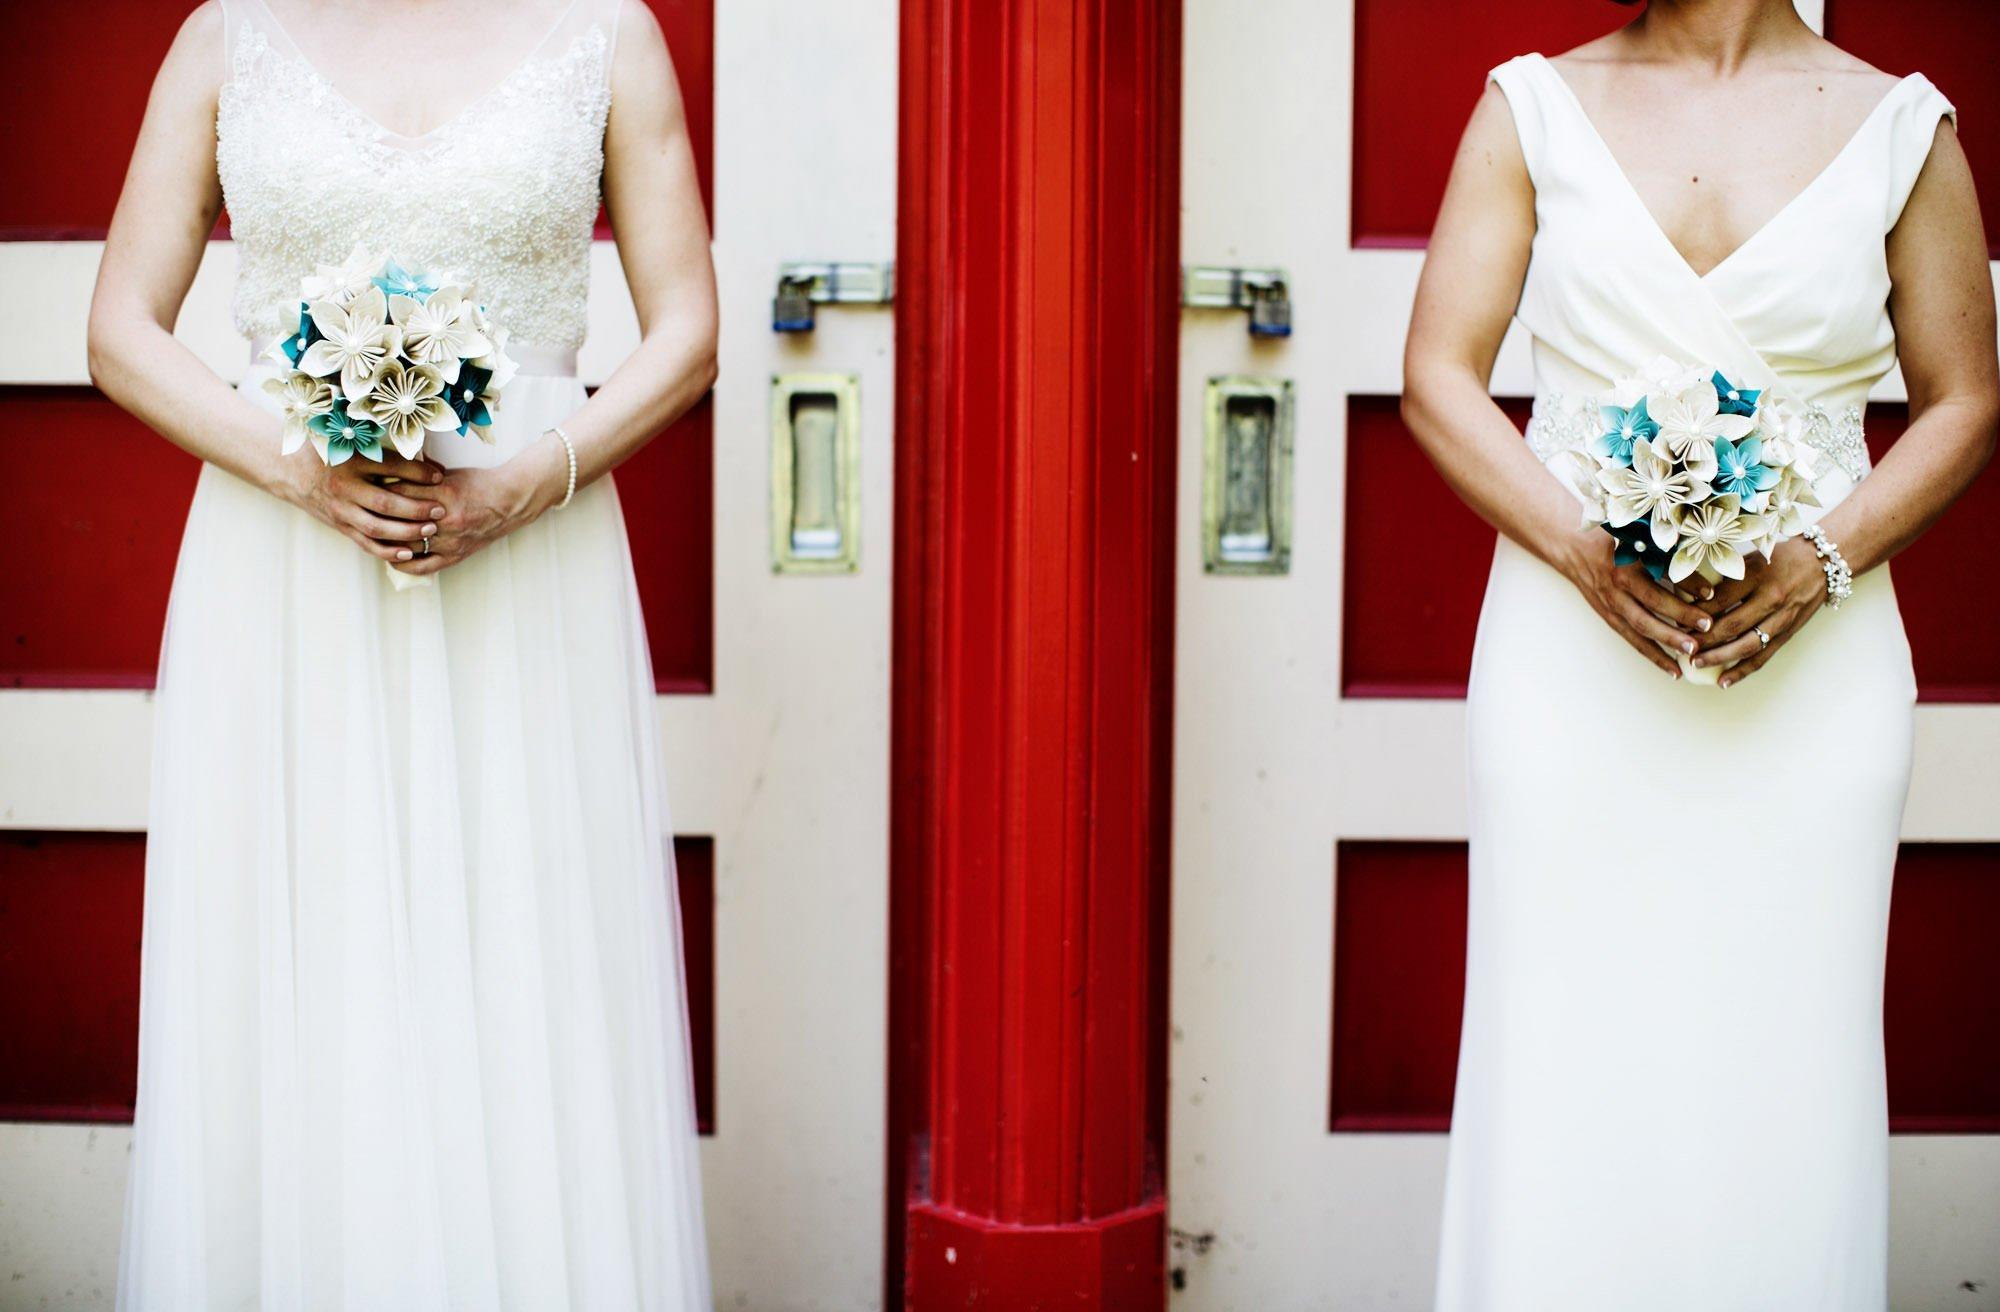 The brides show off their DIY bouquets at their Glen Echo Park wedding.